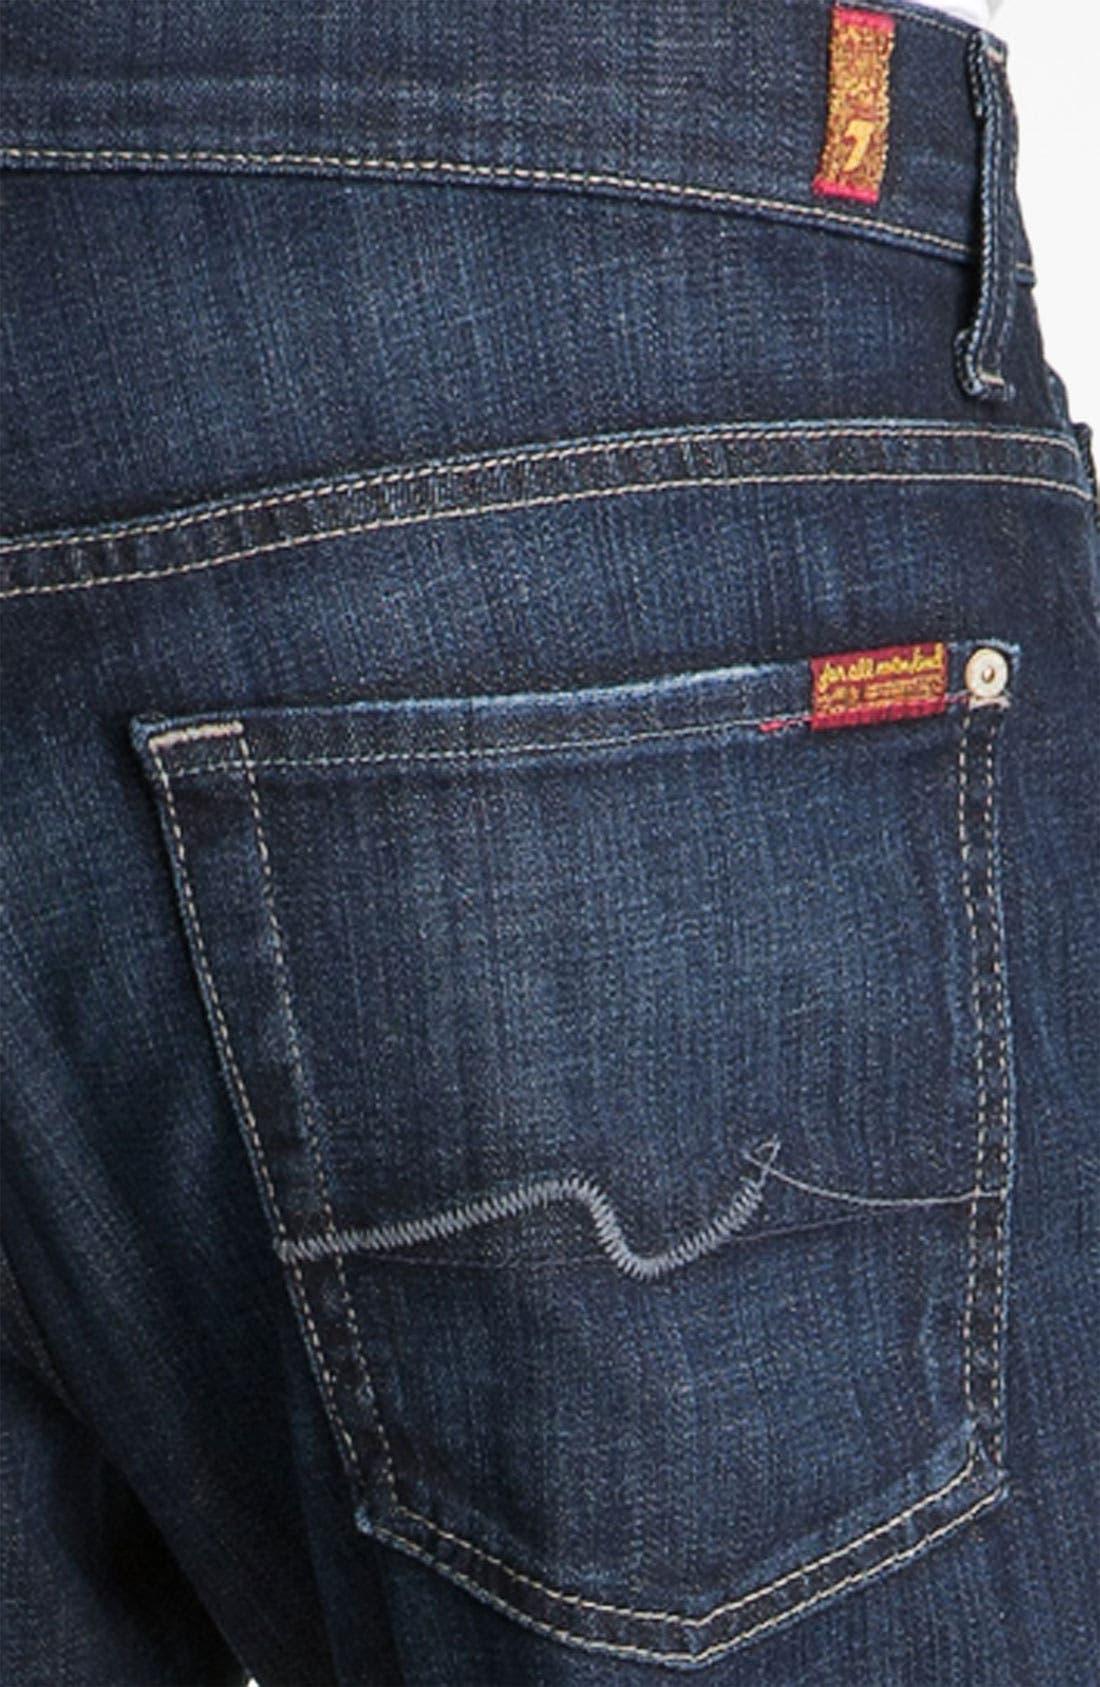 Austyn Relaxed Straight Leg Jeans,                             Alternate thumbnail 6, color,                             LOS ANGELES DARK